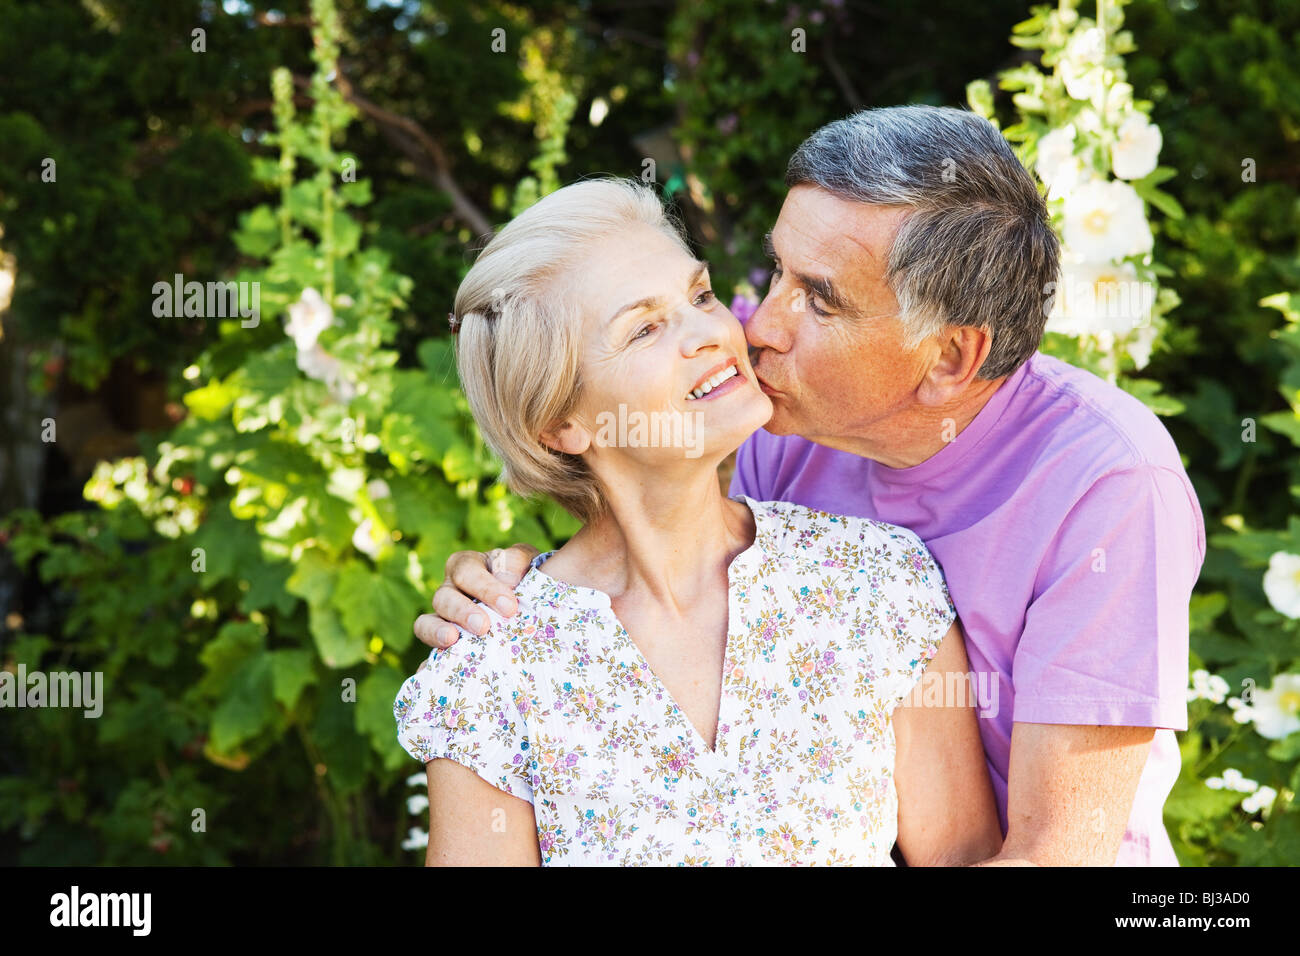 Hombre maduro besos mujer madura. Imagen De Stock